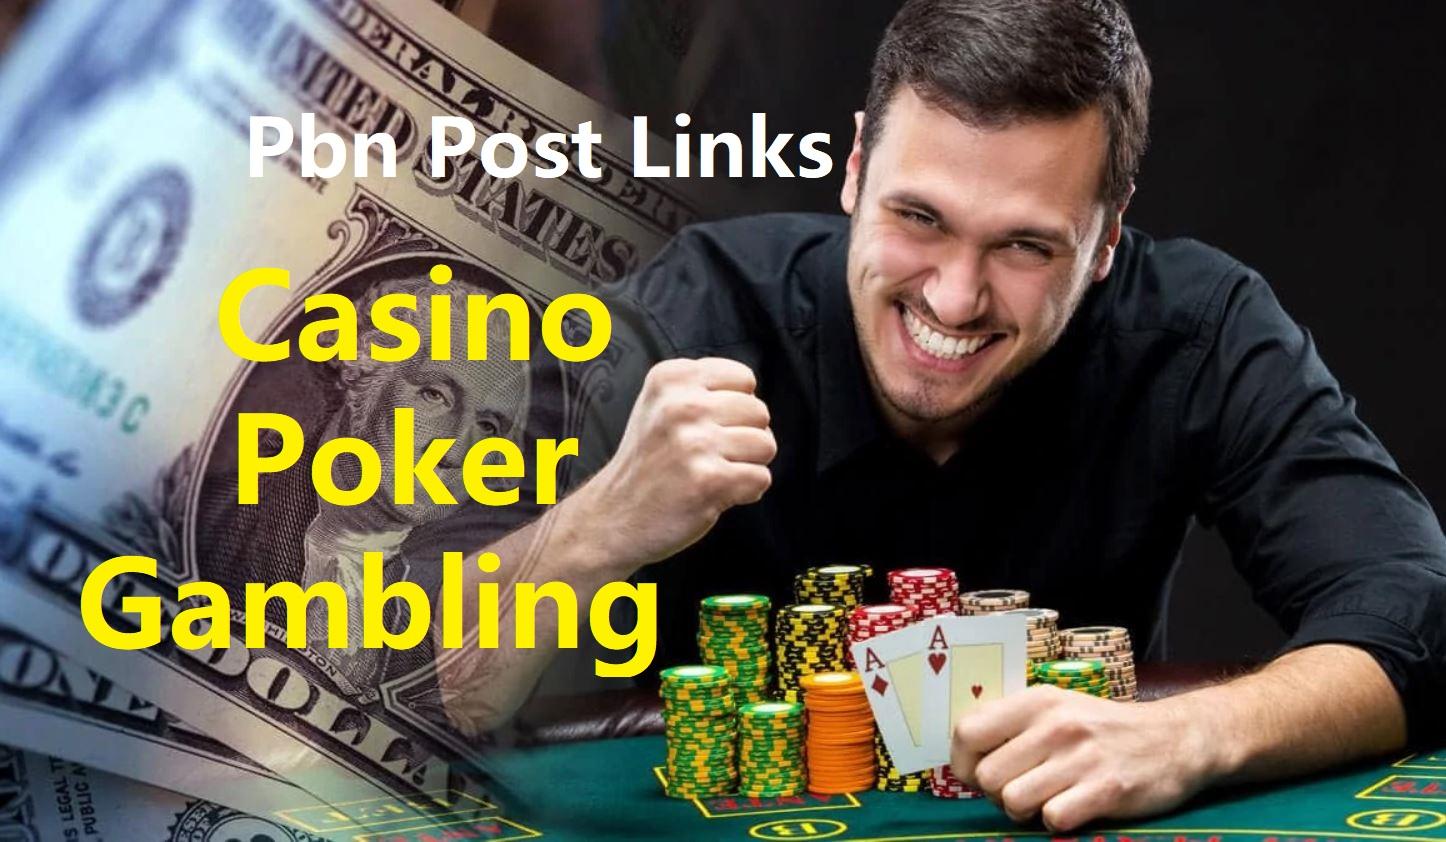 Manual make 200 Casino,  Poker,  Gambling High Quality DA/PA 20+ Homepage PBN Post Backlinks